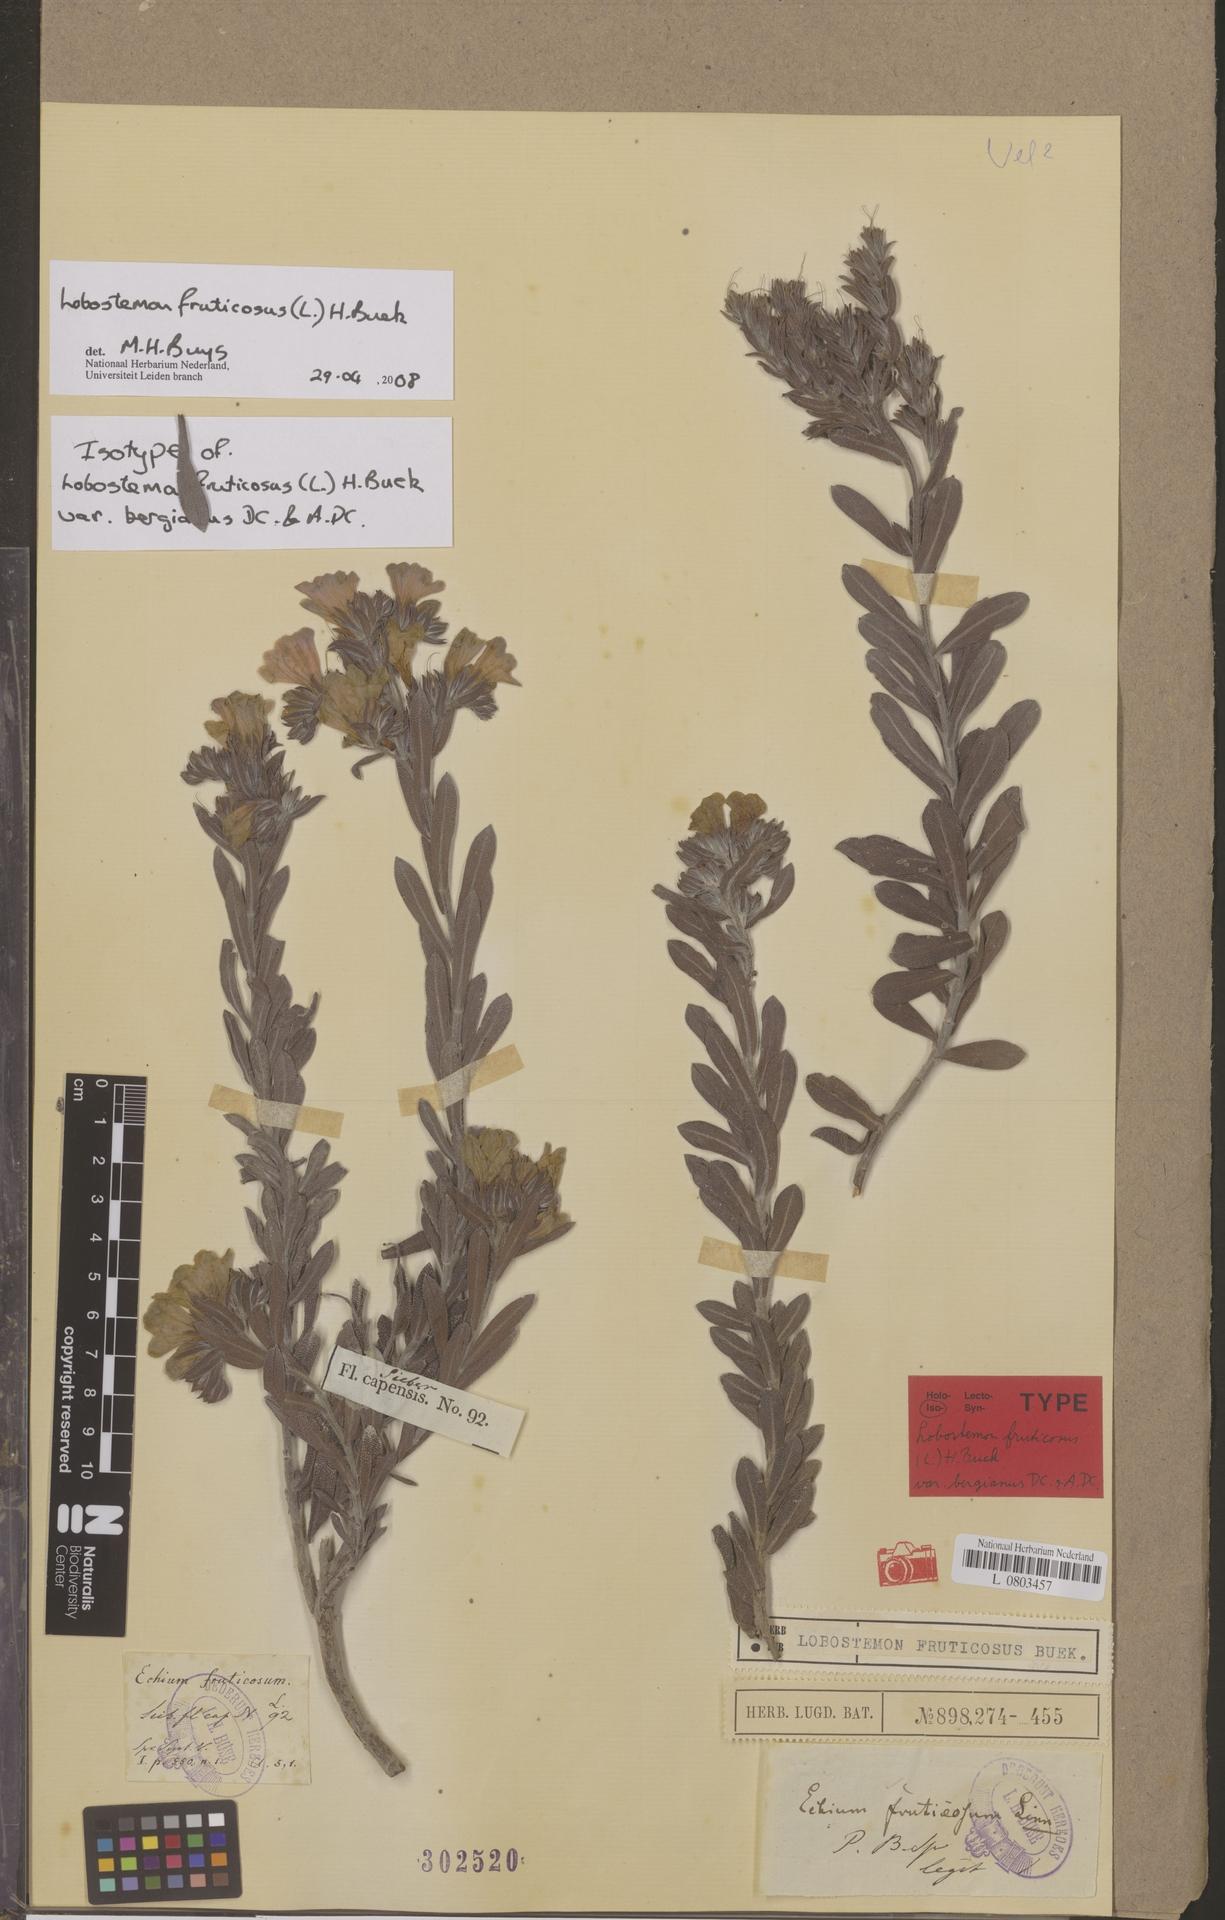 L  0803457   Lobostemon fruticosus (L.) H.Buek